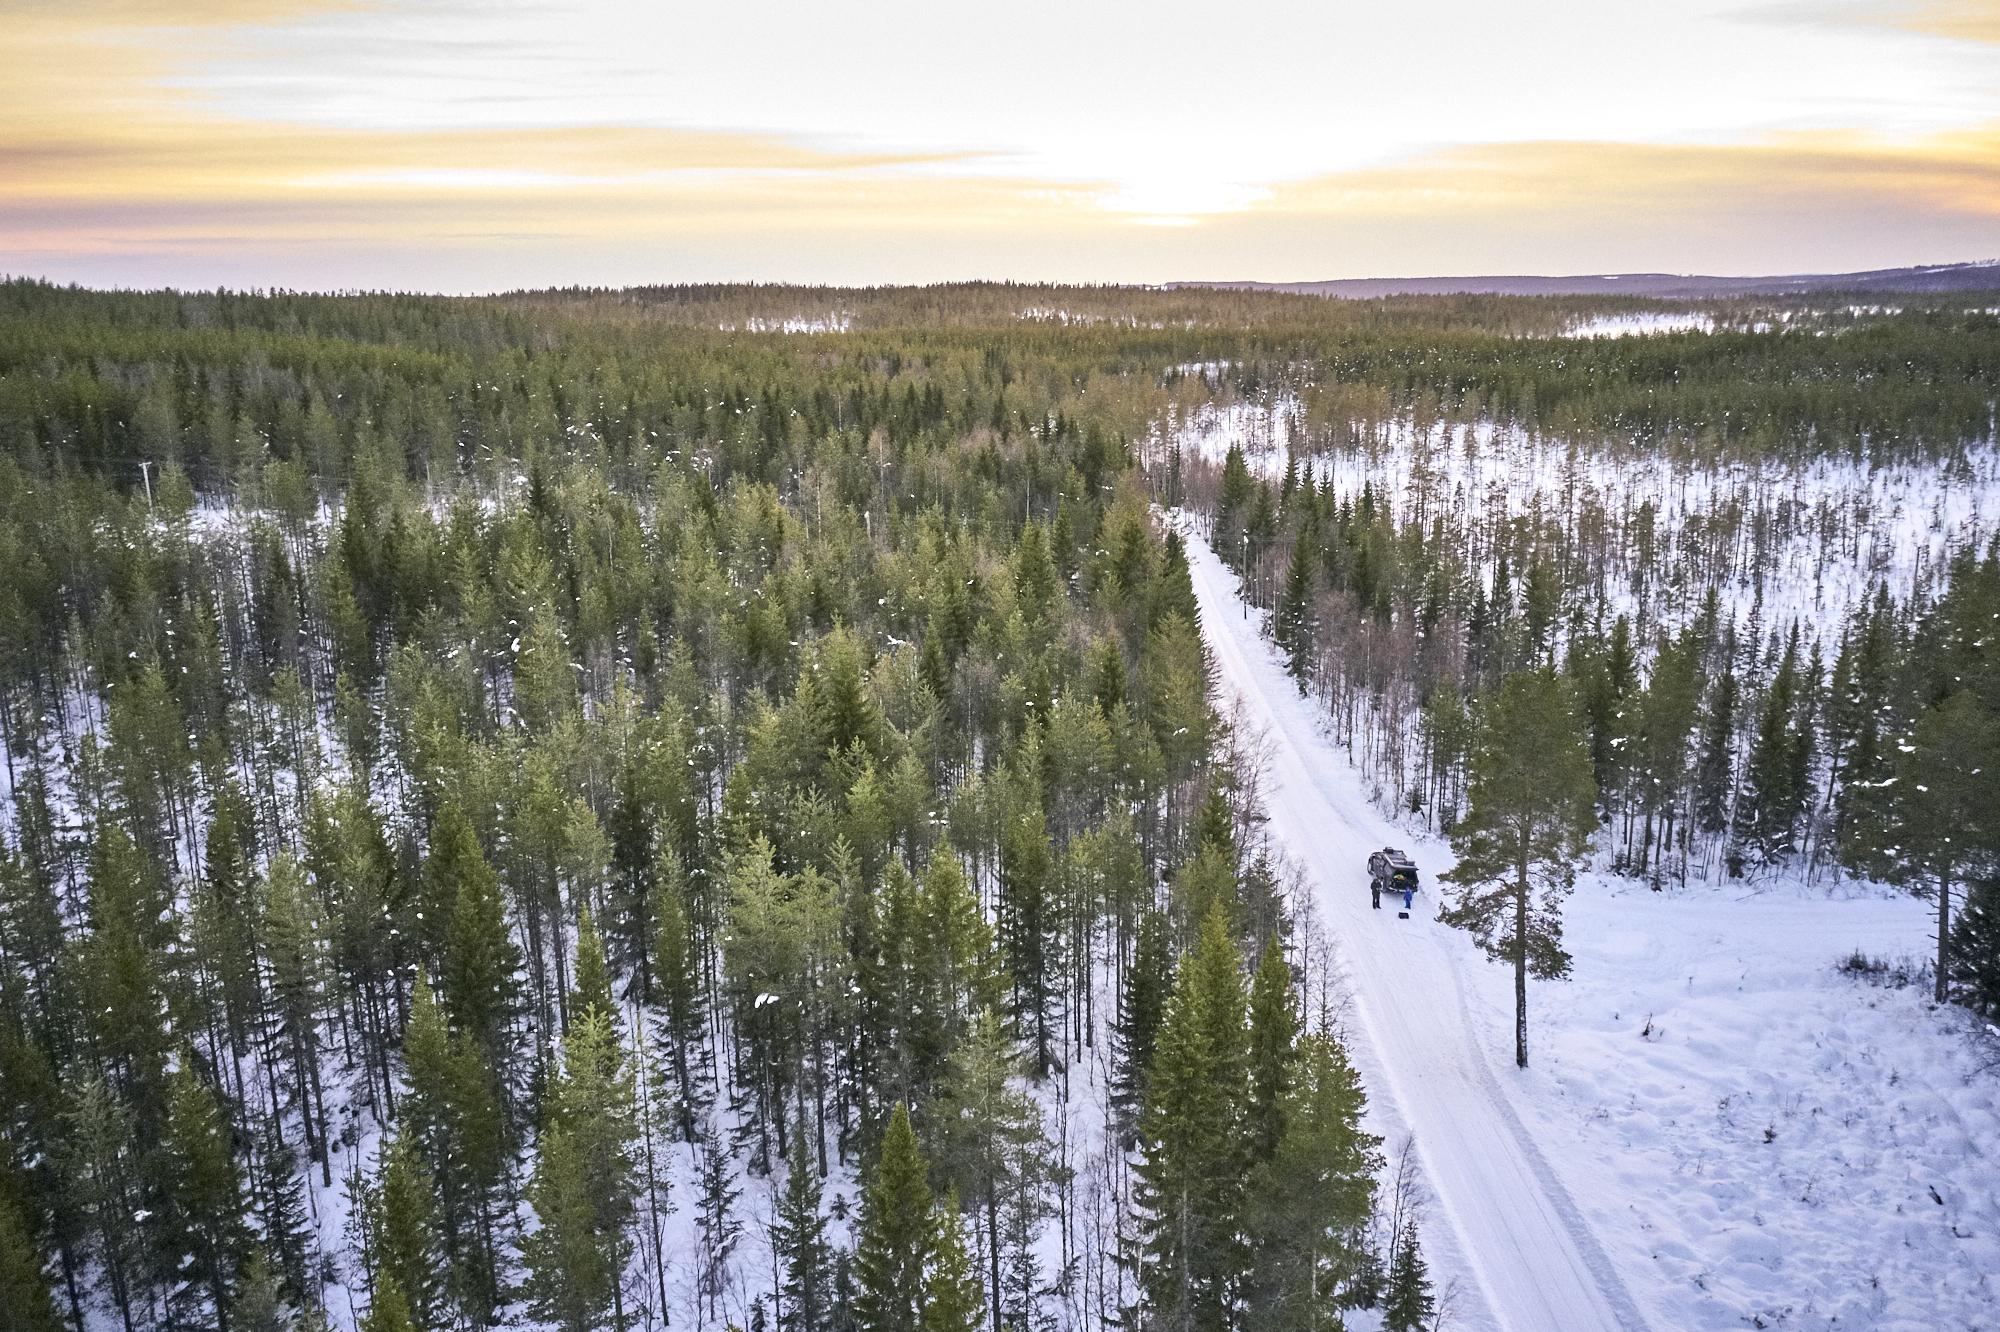 Zweden-2018-DJI_0253.jpg